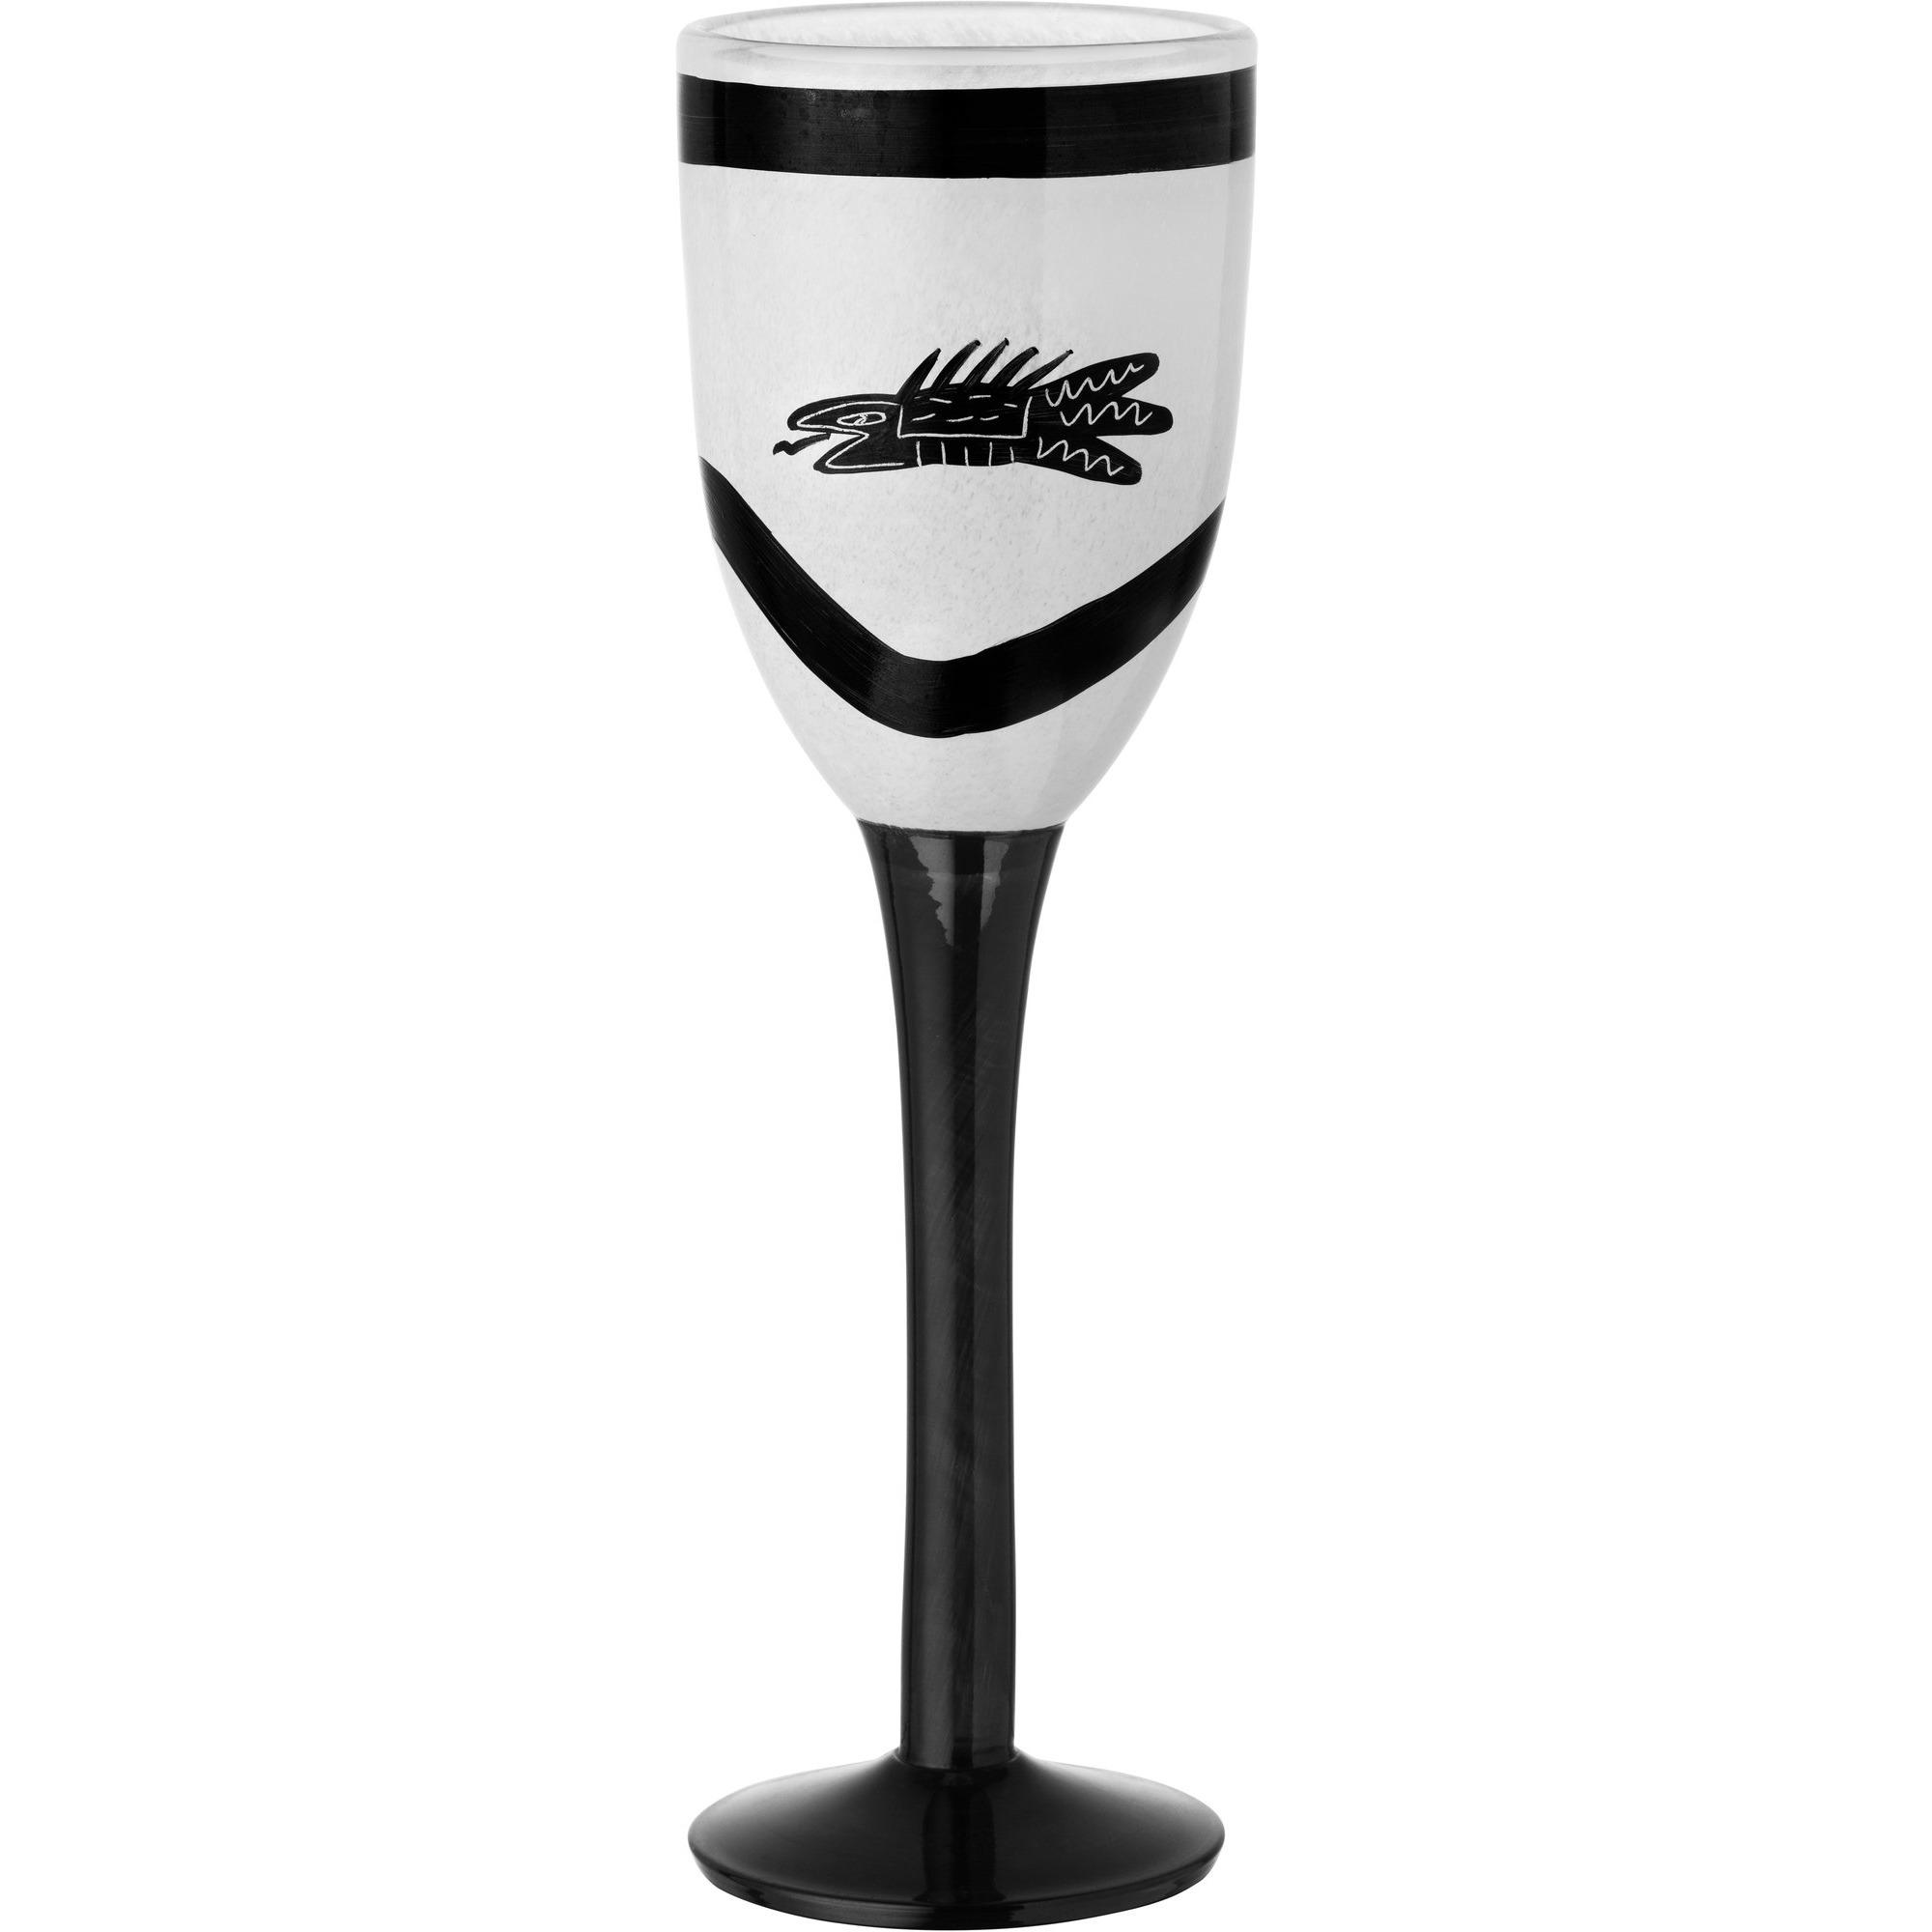 Kosta Boda Pokal Caramba 25 cm